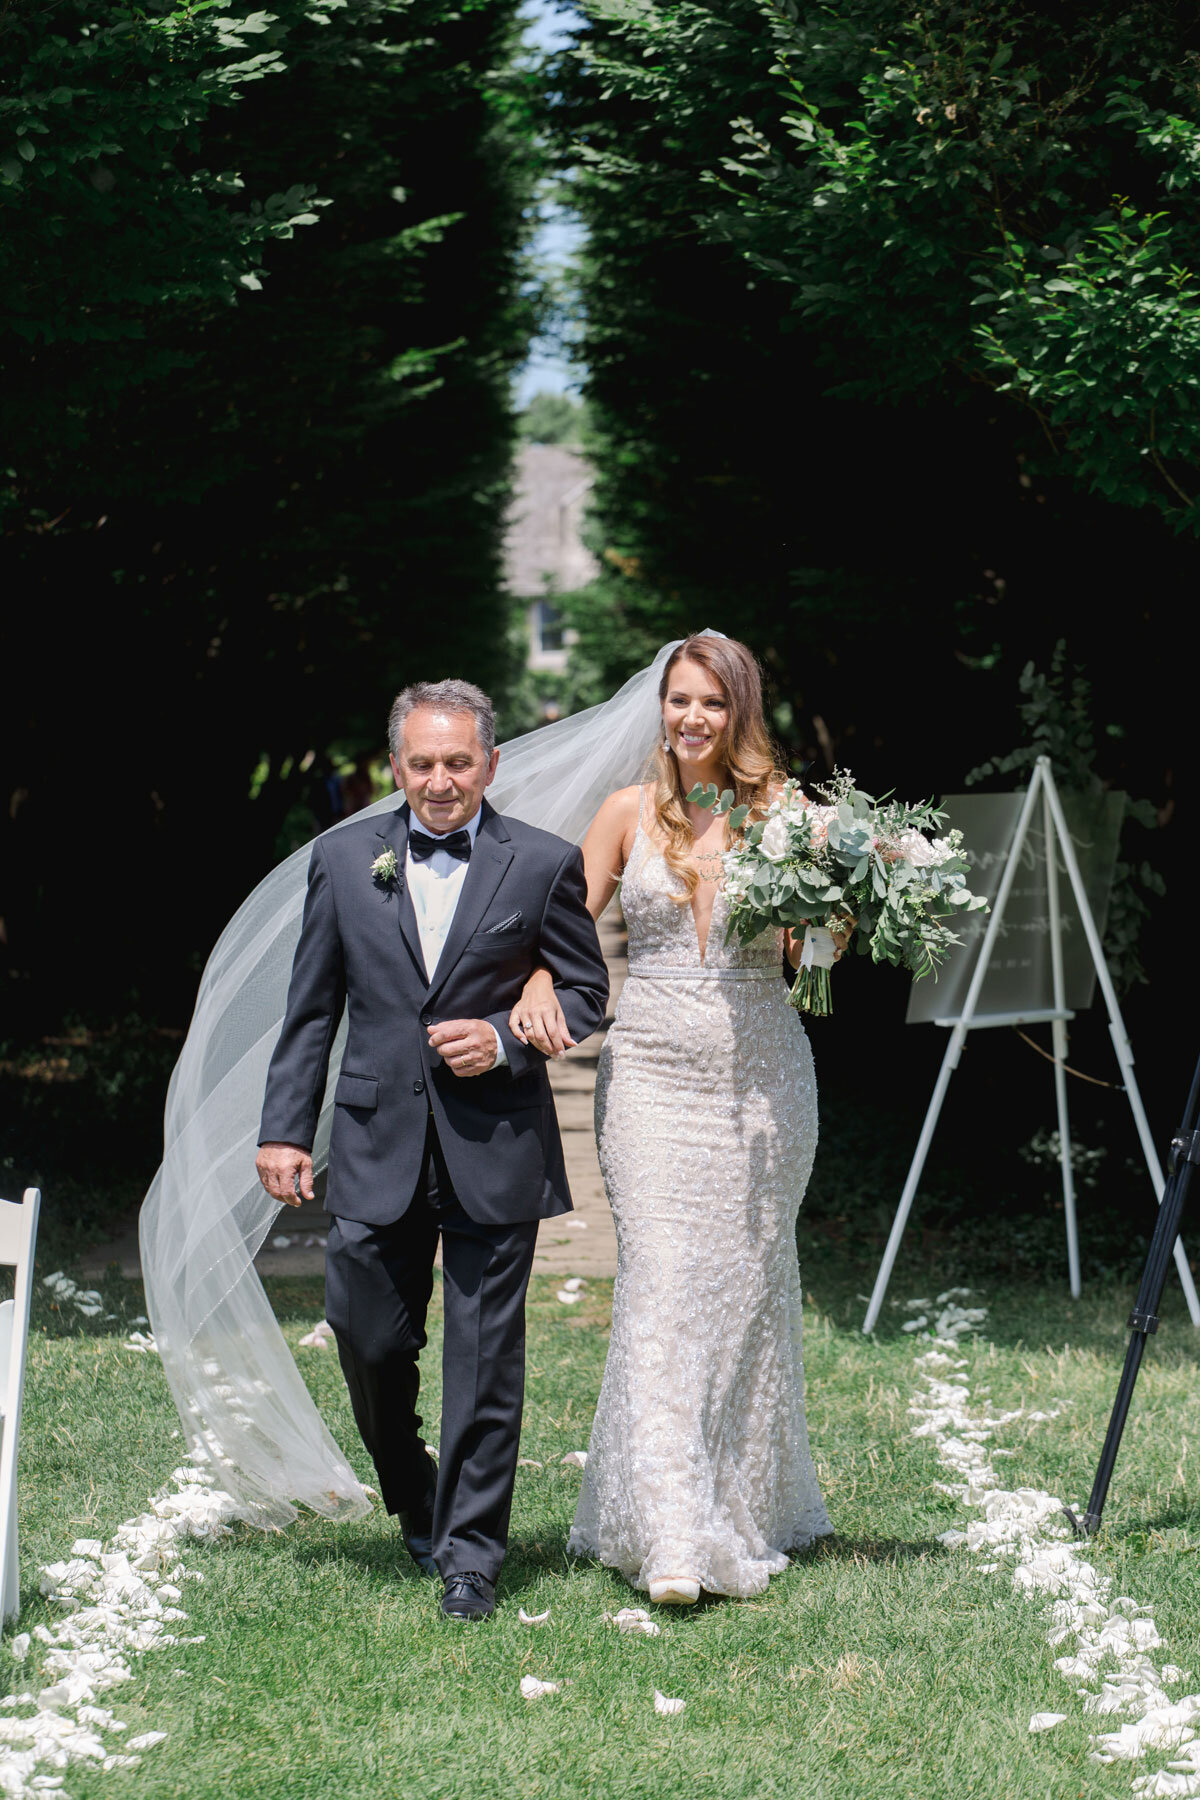 Chateau-des-Charmes-Wedding-Summer-Vineyard-Bride-Niagara-on-the-Lake-photos-by-Gemini-Photography-Ontario-0015.jpg